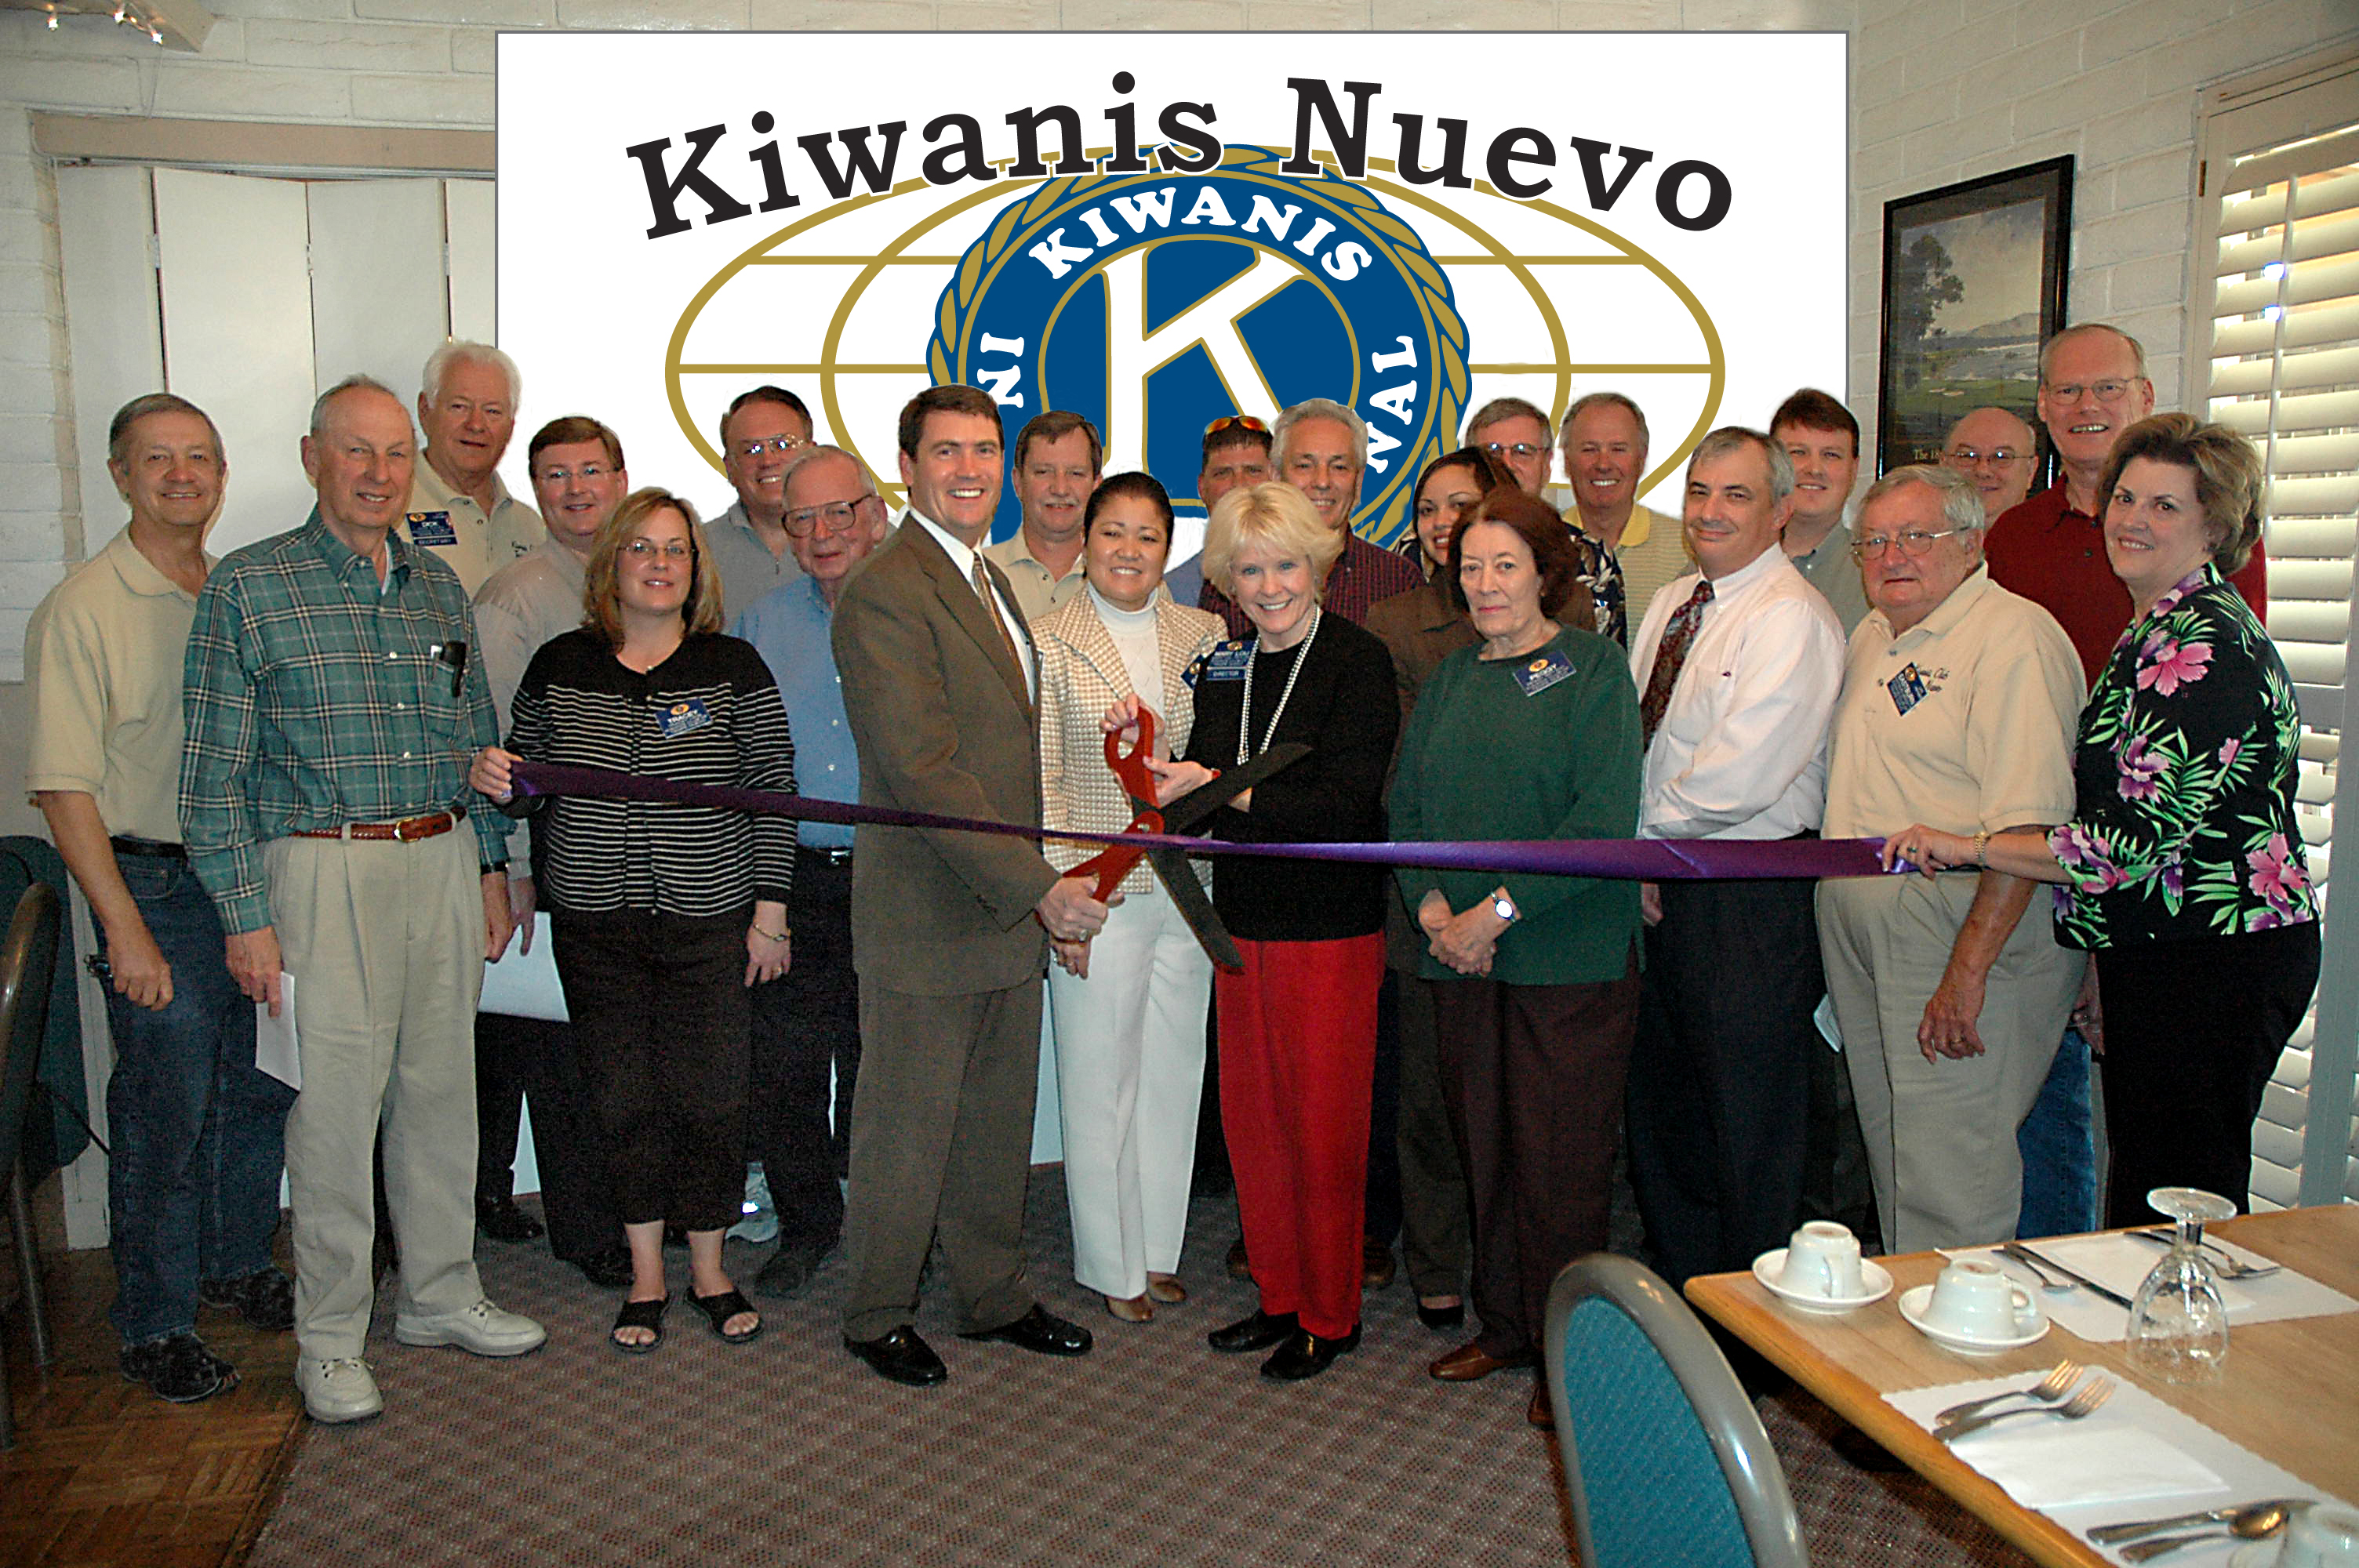 Kiwanis Nuevo President